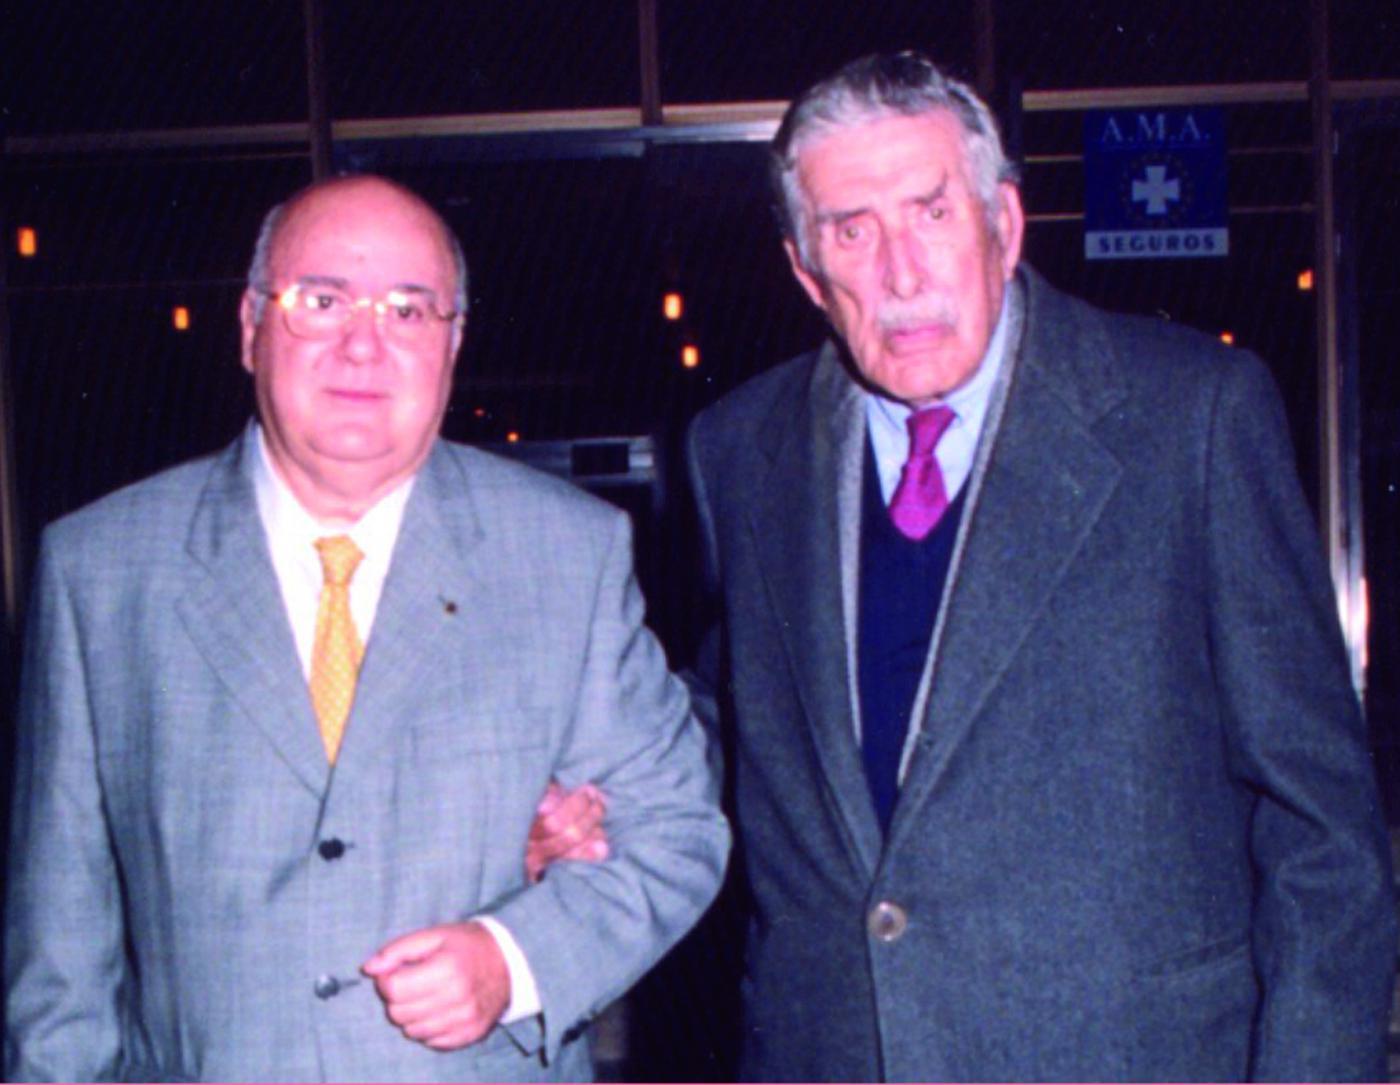 El fundador de Abengoa, Javier Benjumea Puigcerver (1915-2001), junto al periodista Nicolás Salas.